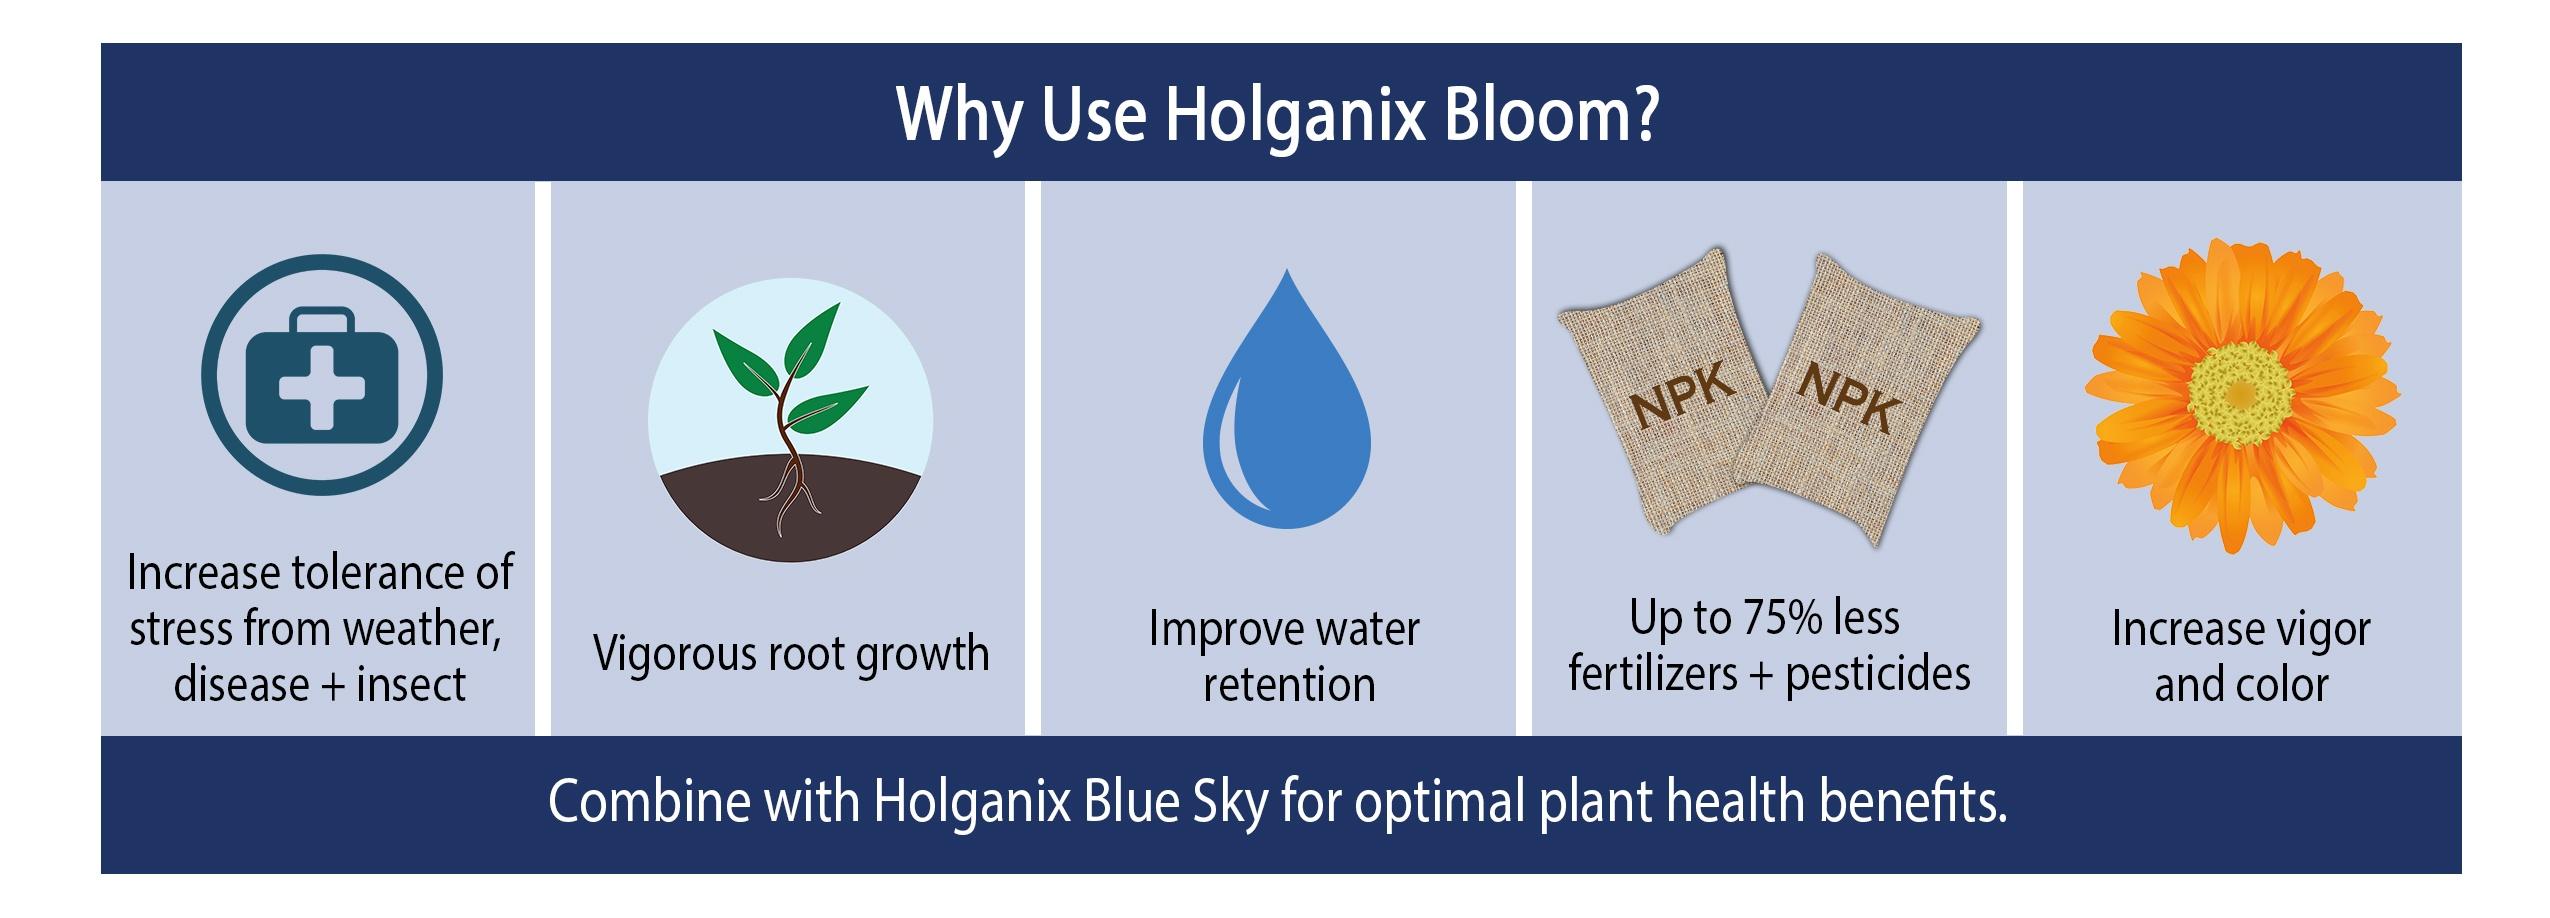 Why use Holganix bloom.jpg